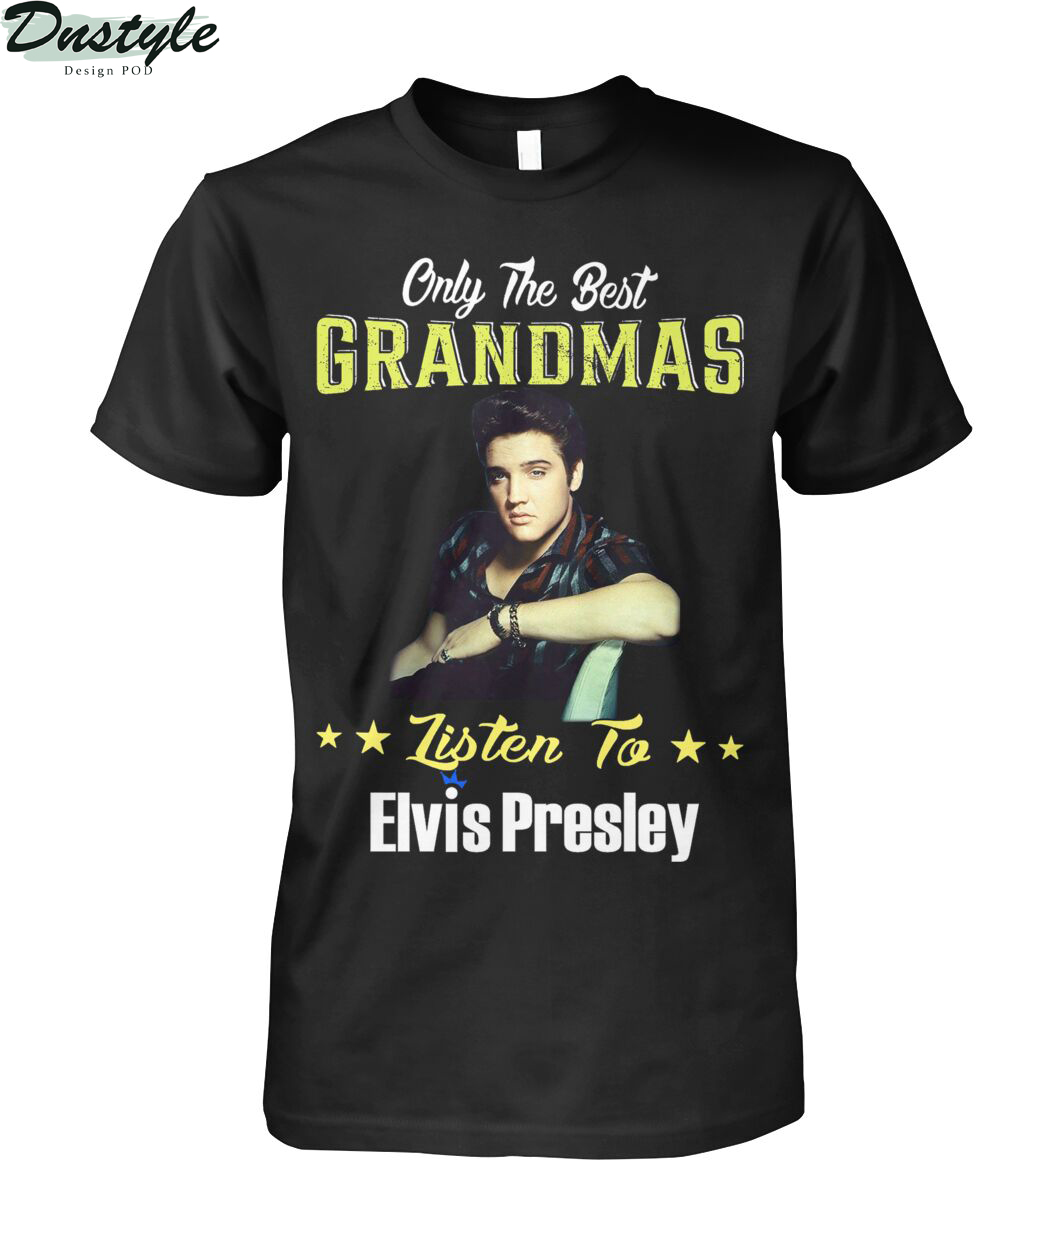 Only the best grandmas listen to elvis presley shirt